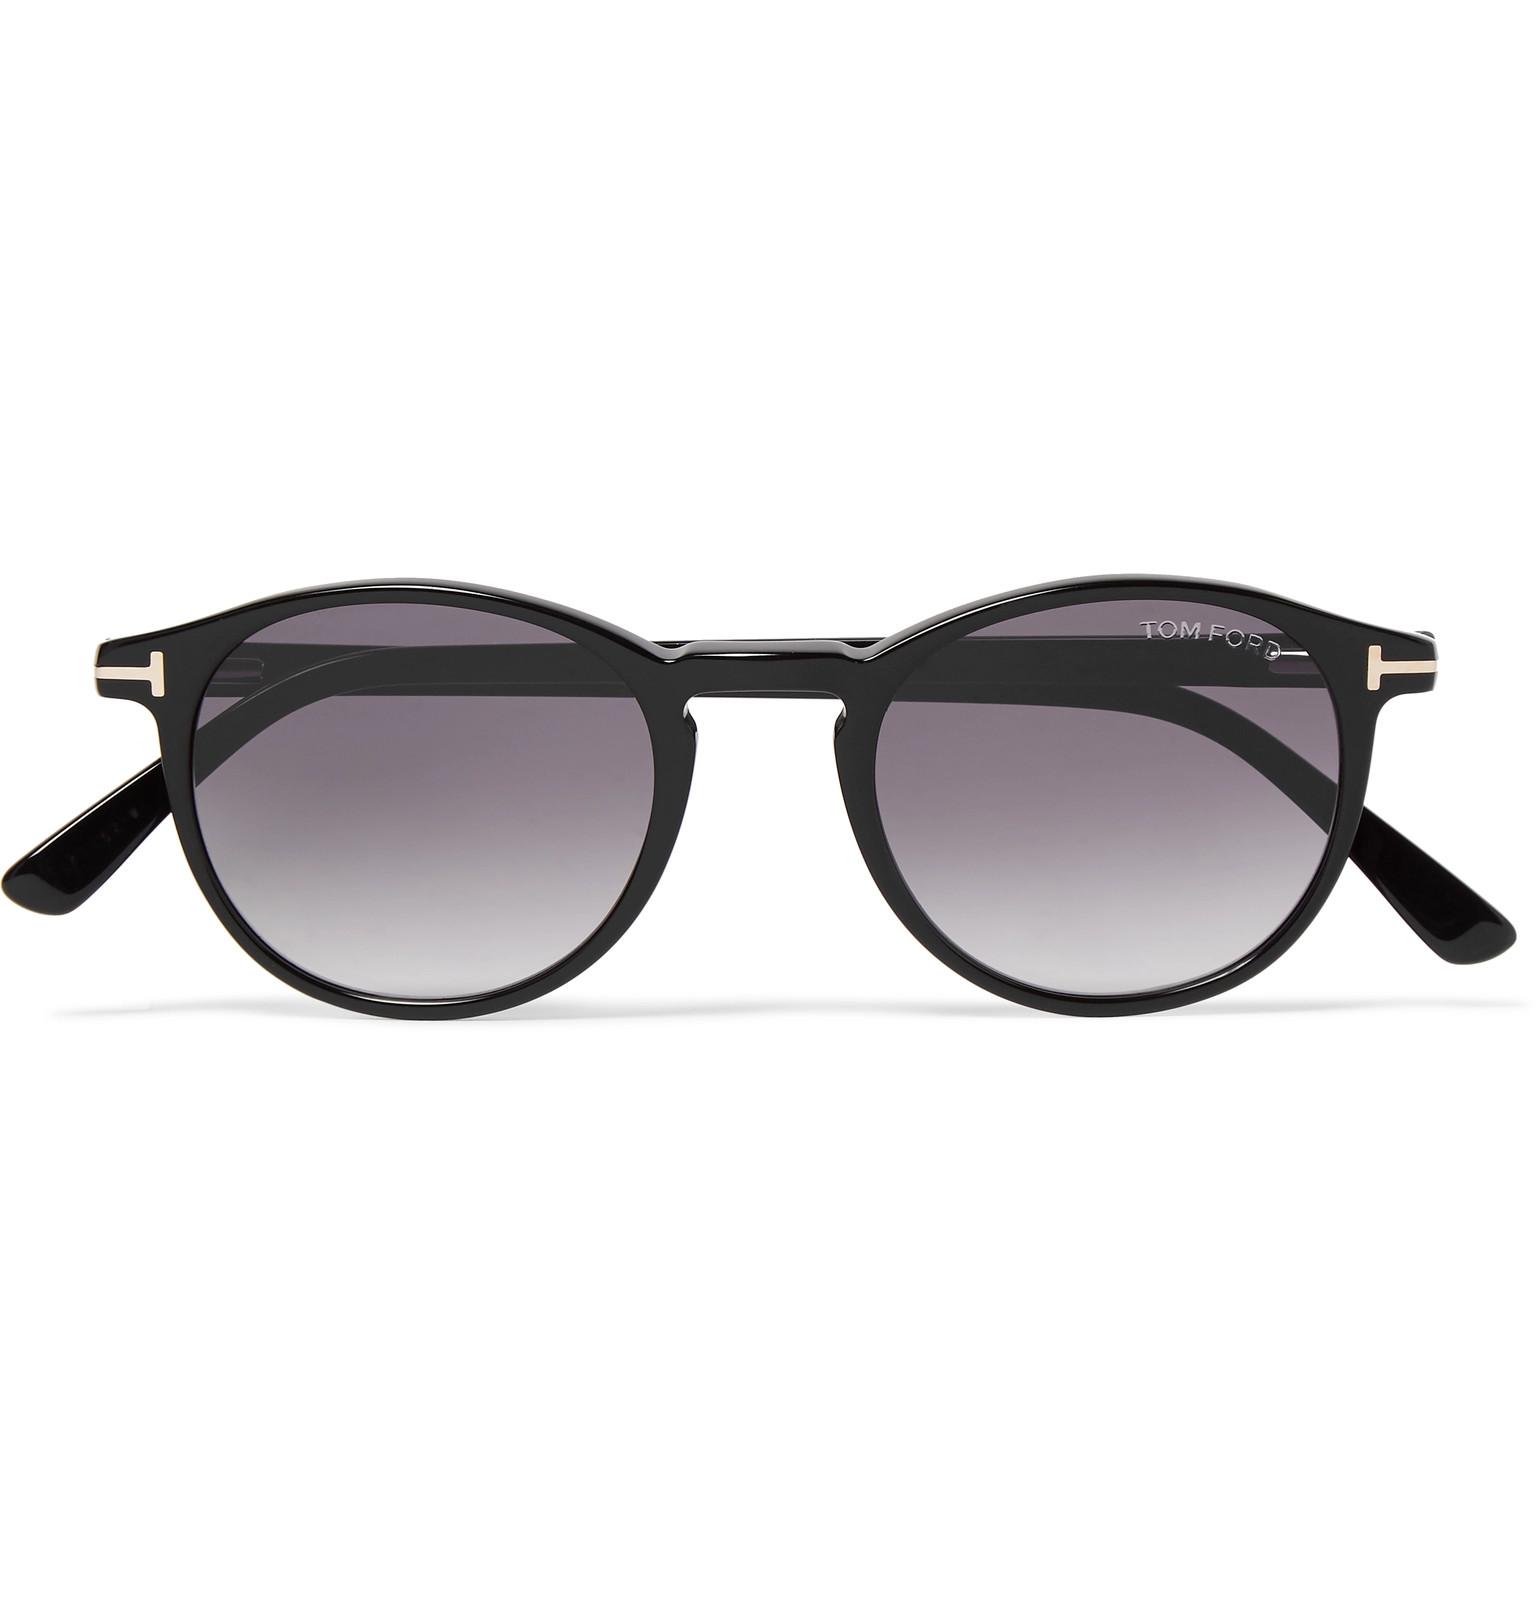 d8f0cec10c0 TOM FORD - Andrea-02 Round-Frame Acetate Sunglasses